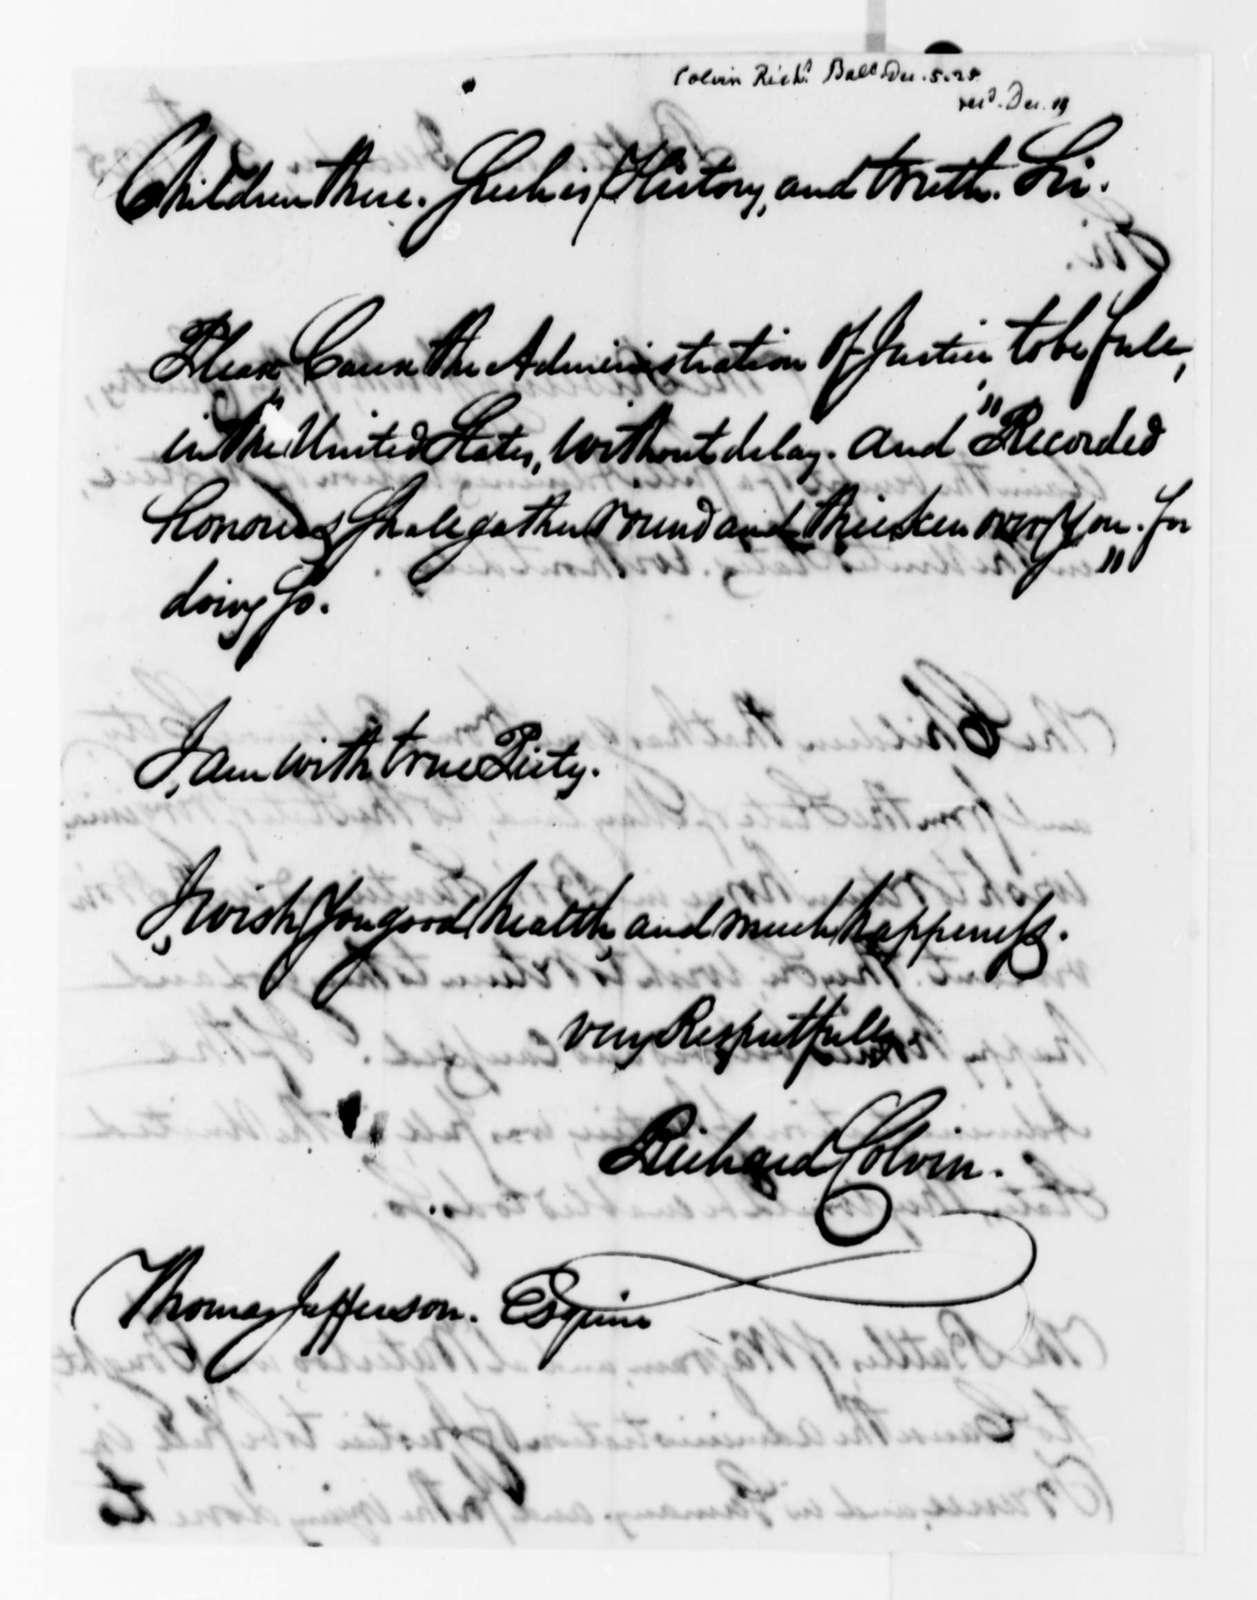 Richard Colvin to Thomas Jefferson, December 5, 1825